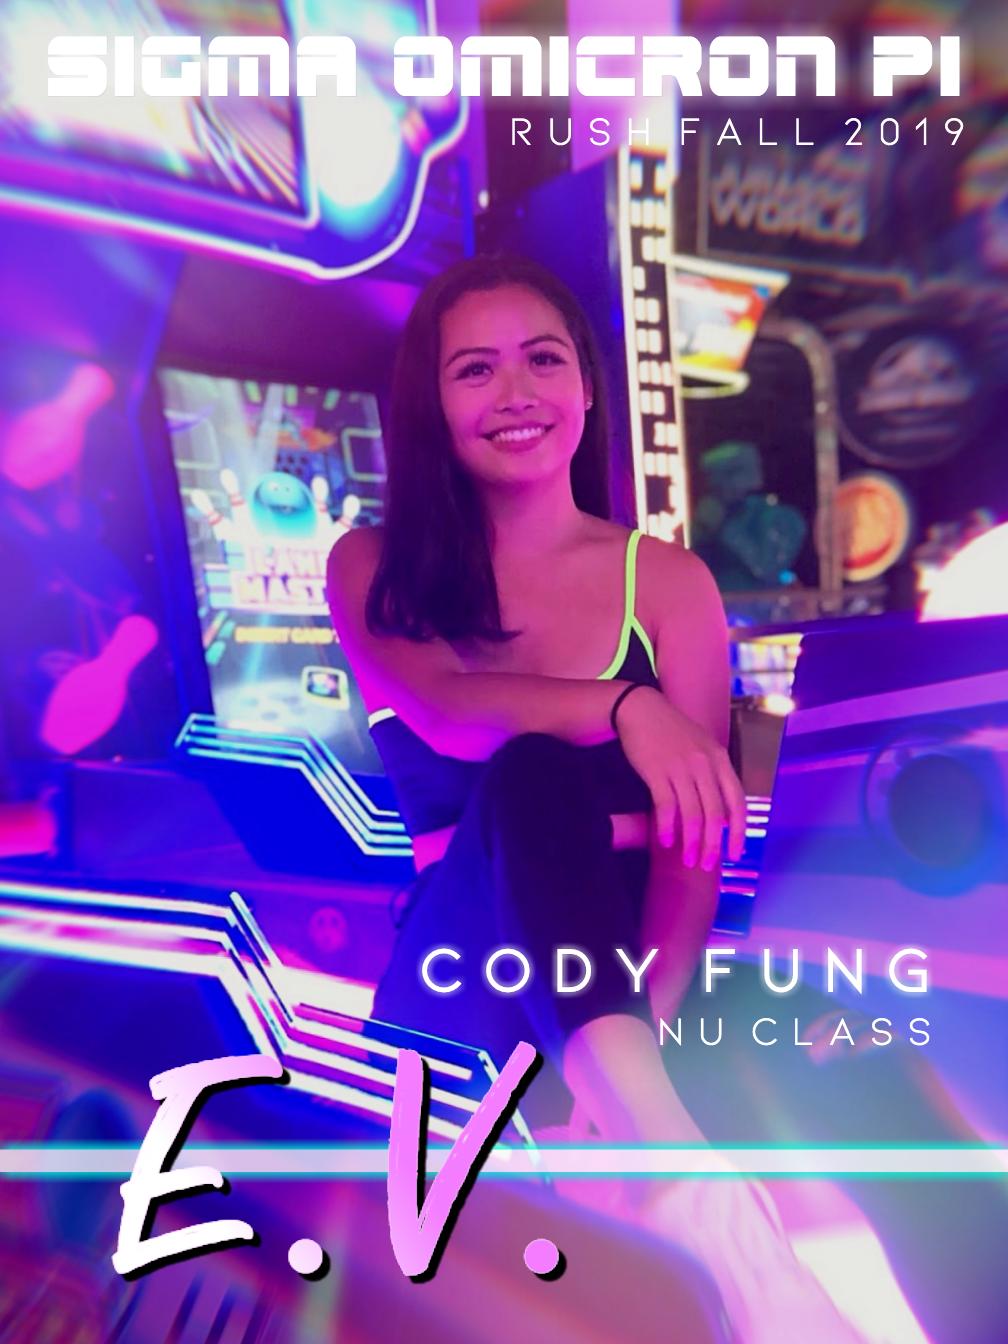 Cody Fung